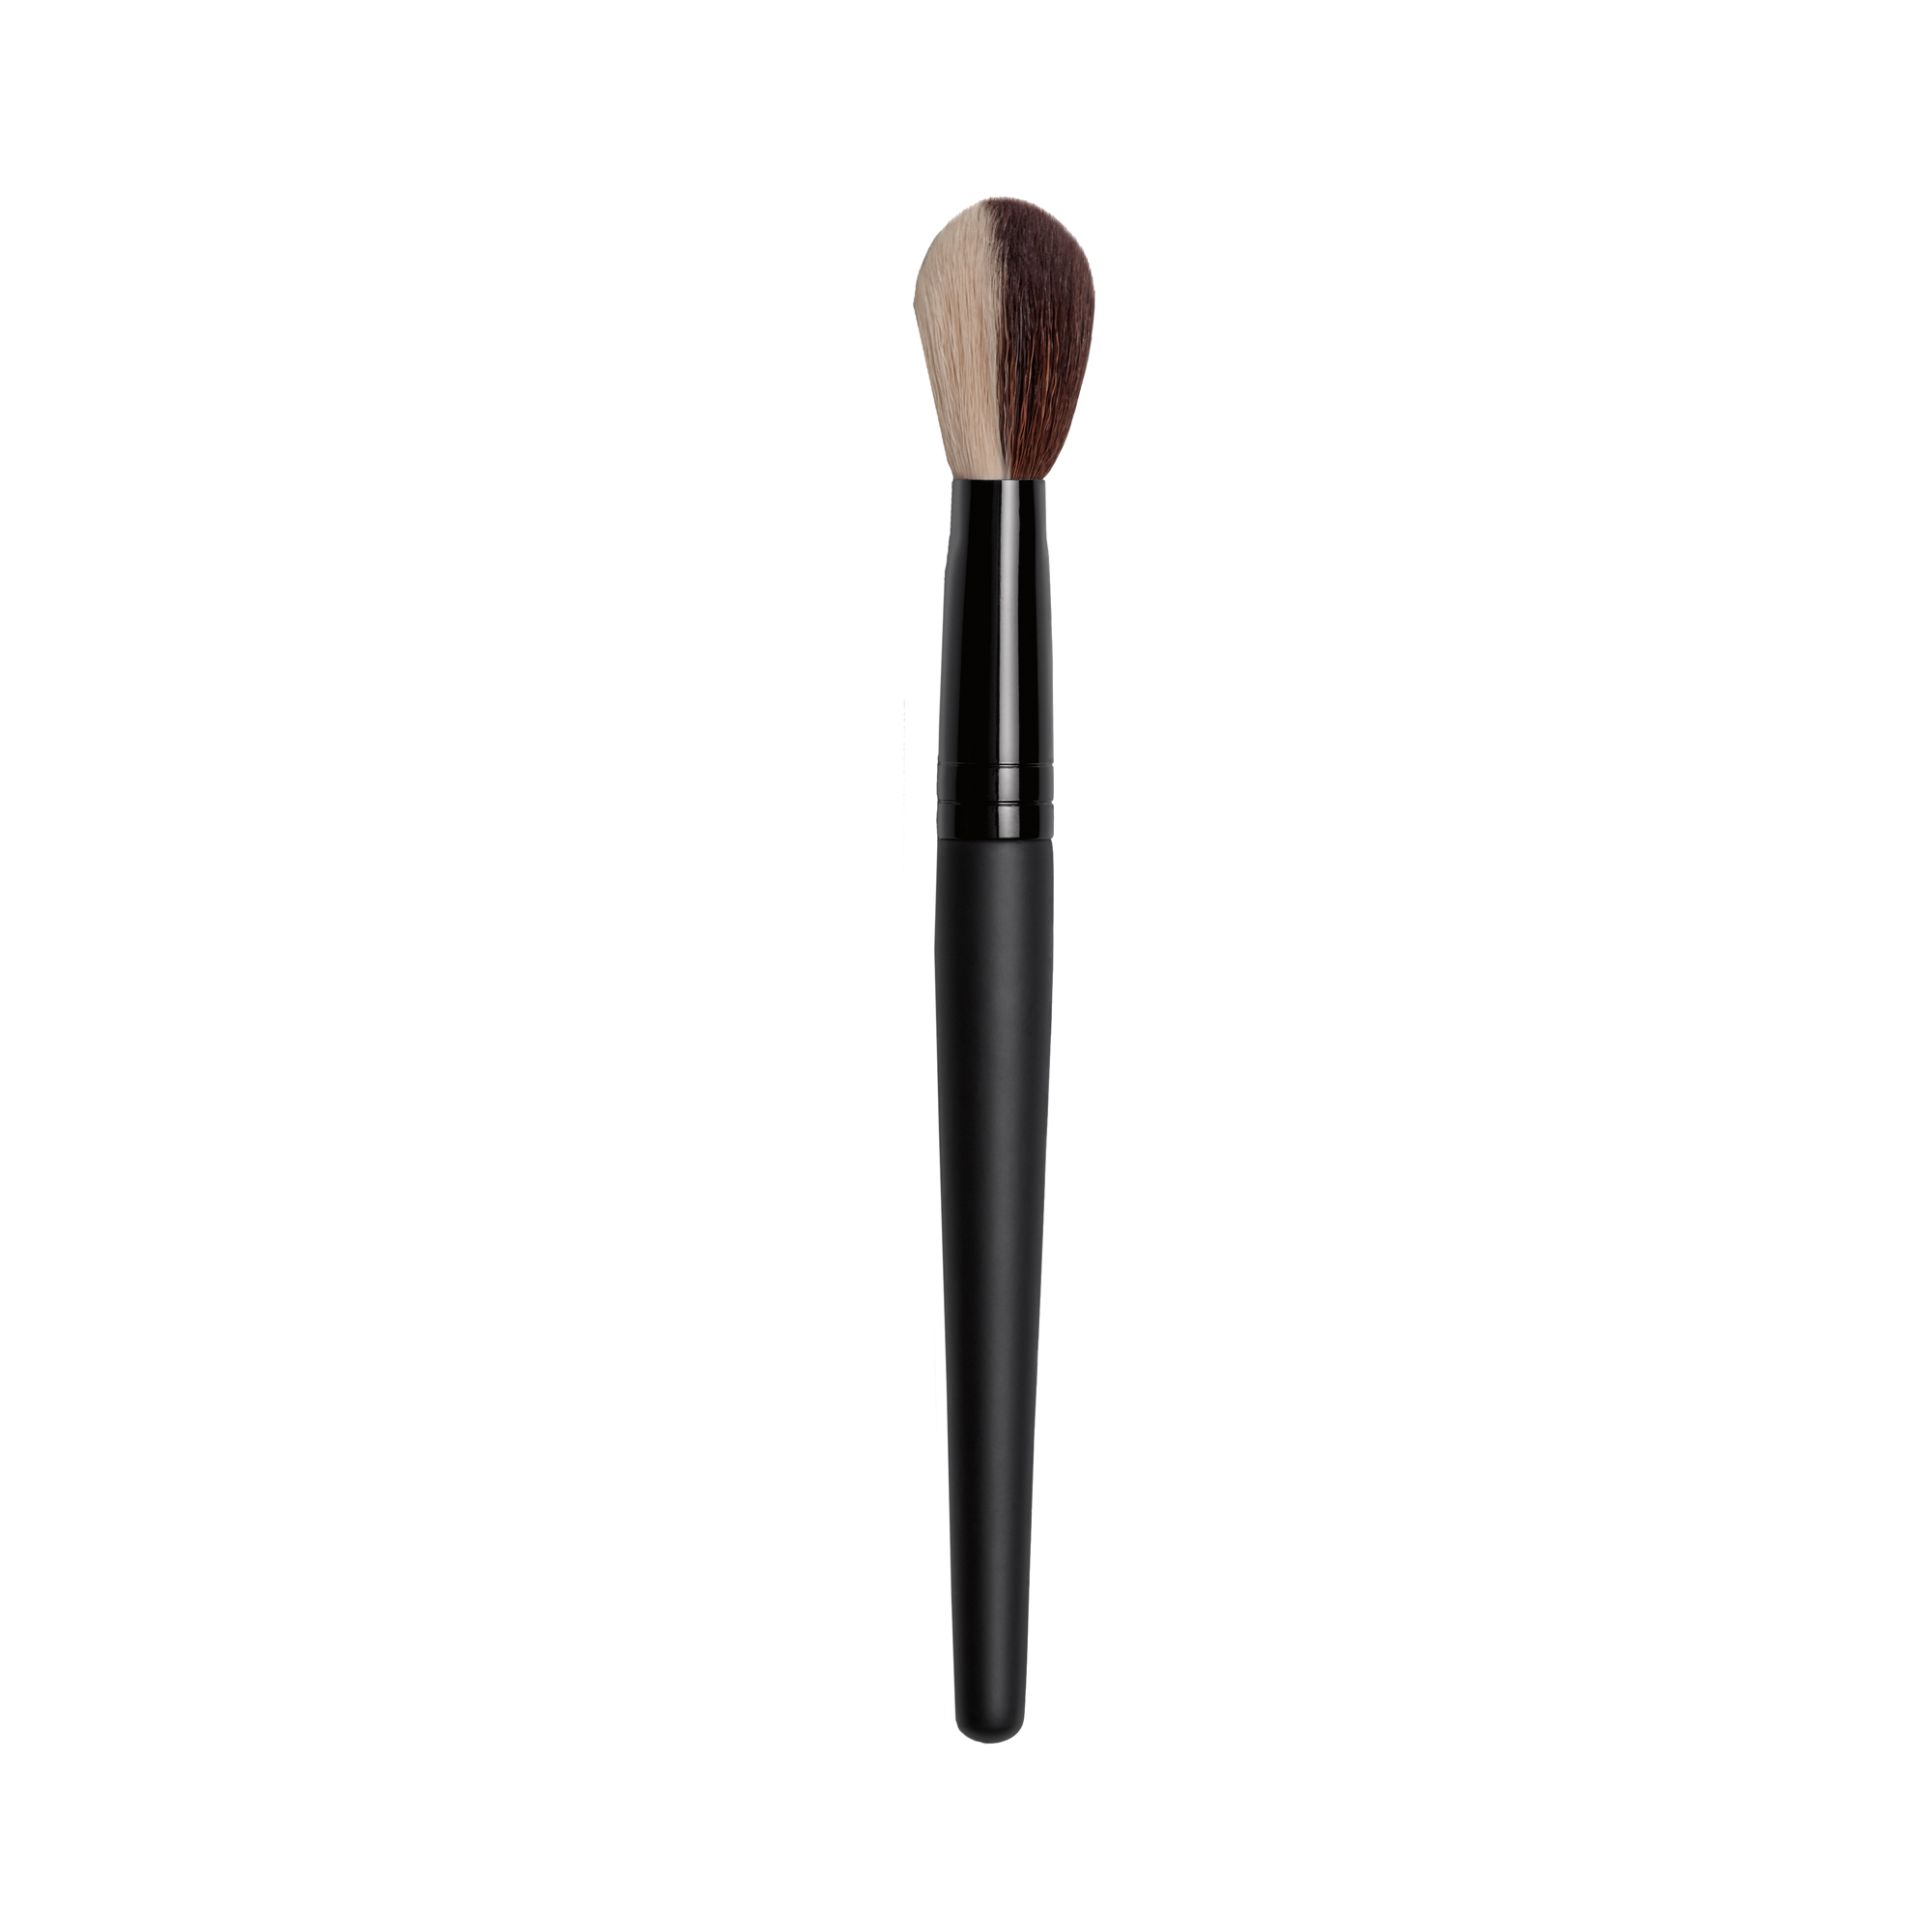 bareMinerals Dual Finish Blush & Contur Brush